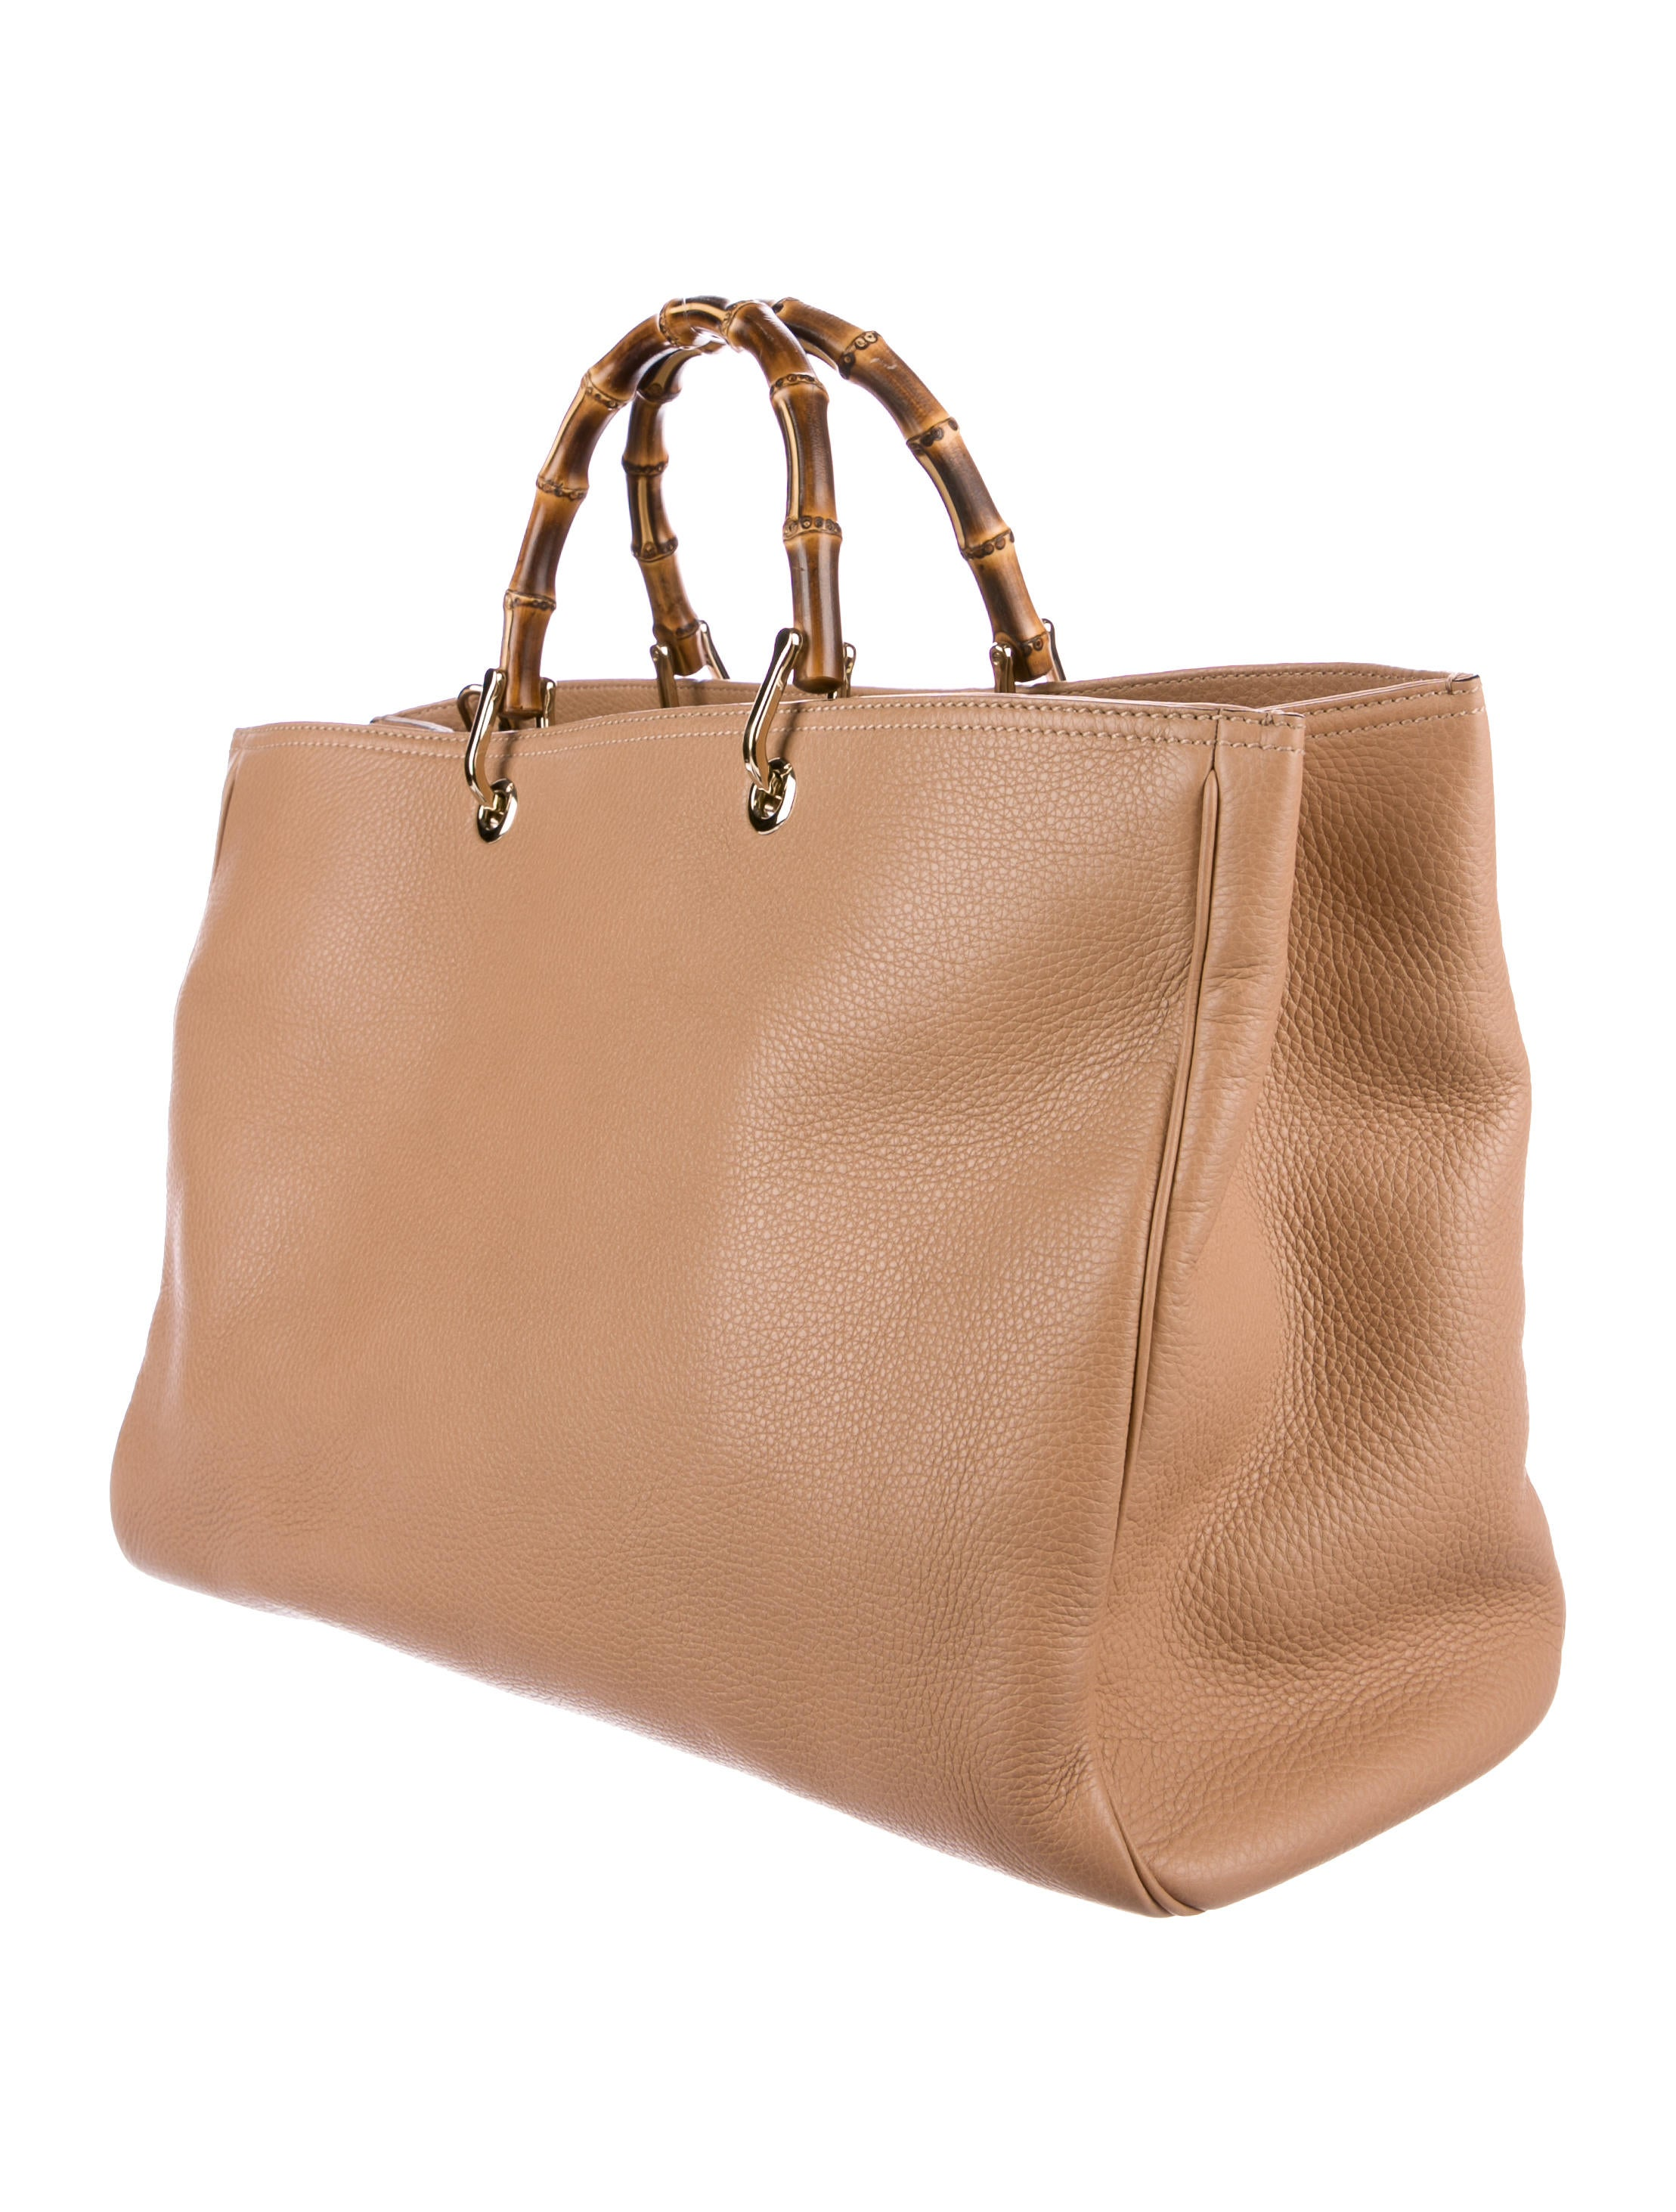 gucci large bamboo shopper tote handbags guc168523 the realreal. Black Bedroom Furniture Sets. Home Design Ideas